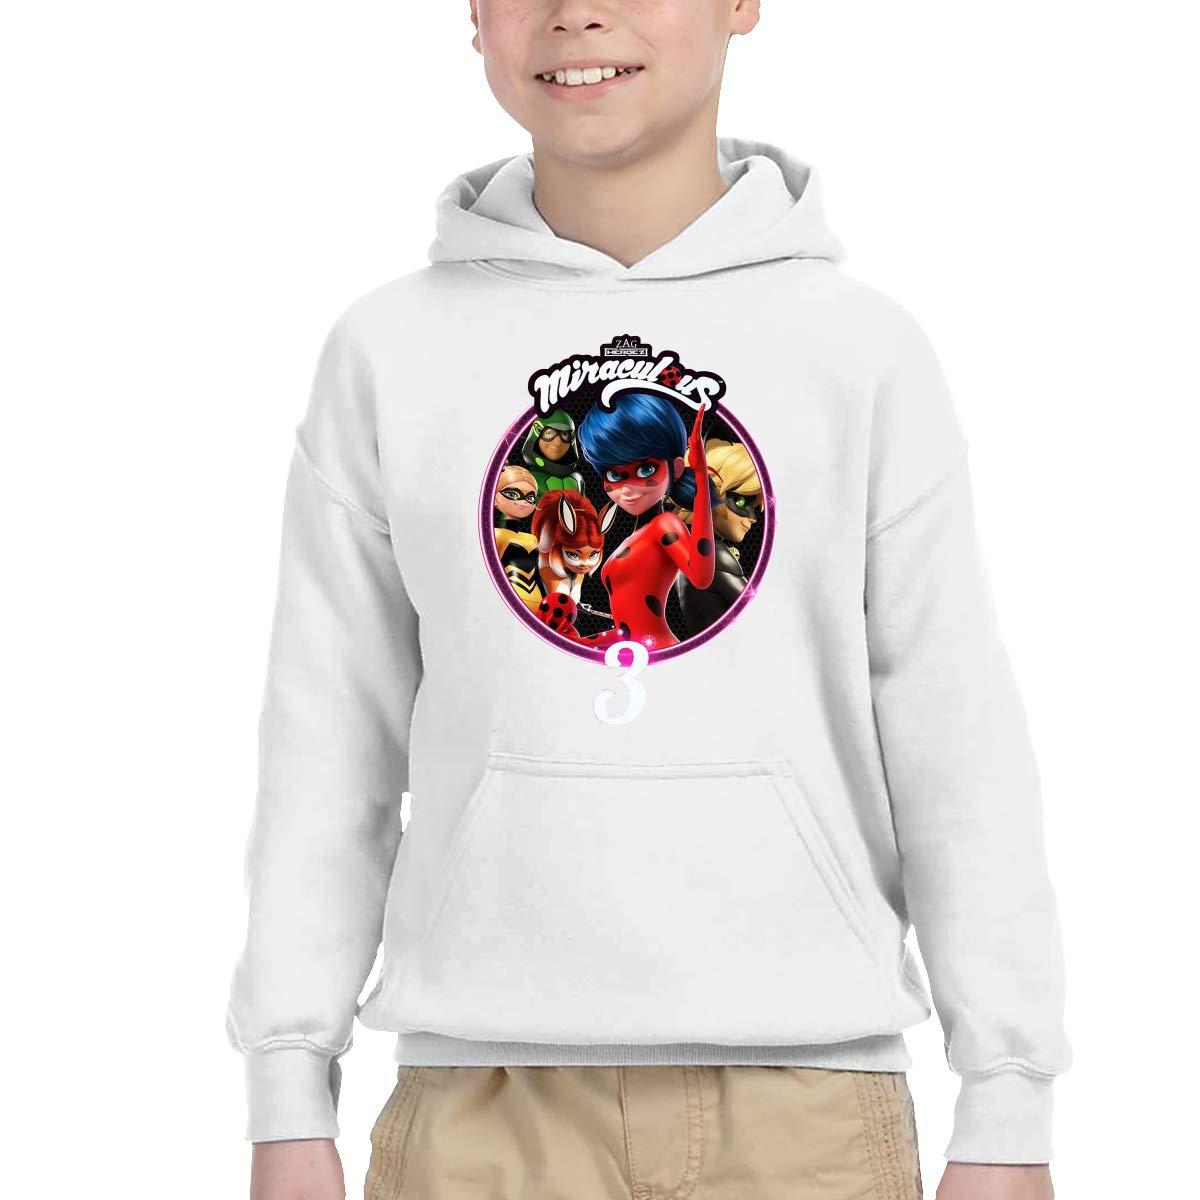 Censu Creative Miraculous Ladybug Fleece Pullover Hoodie for Boys